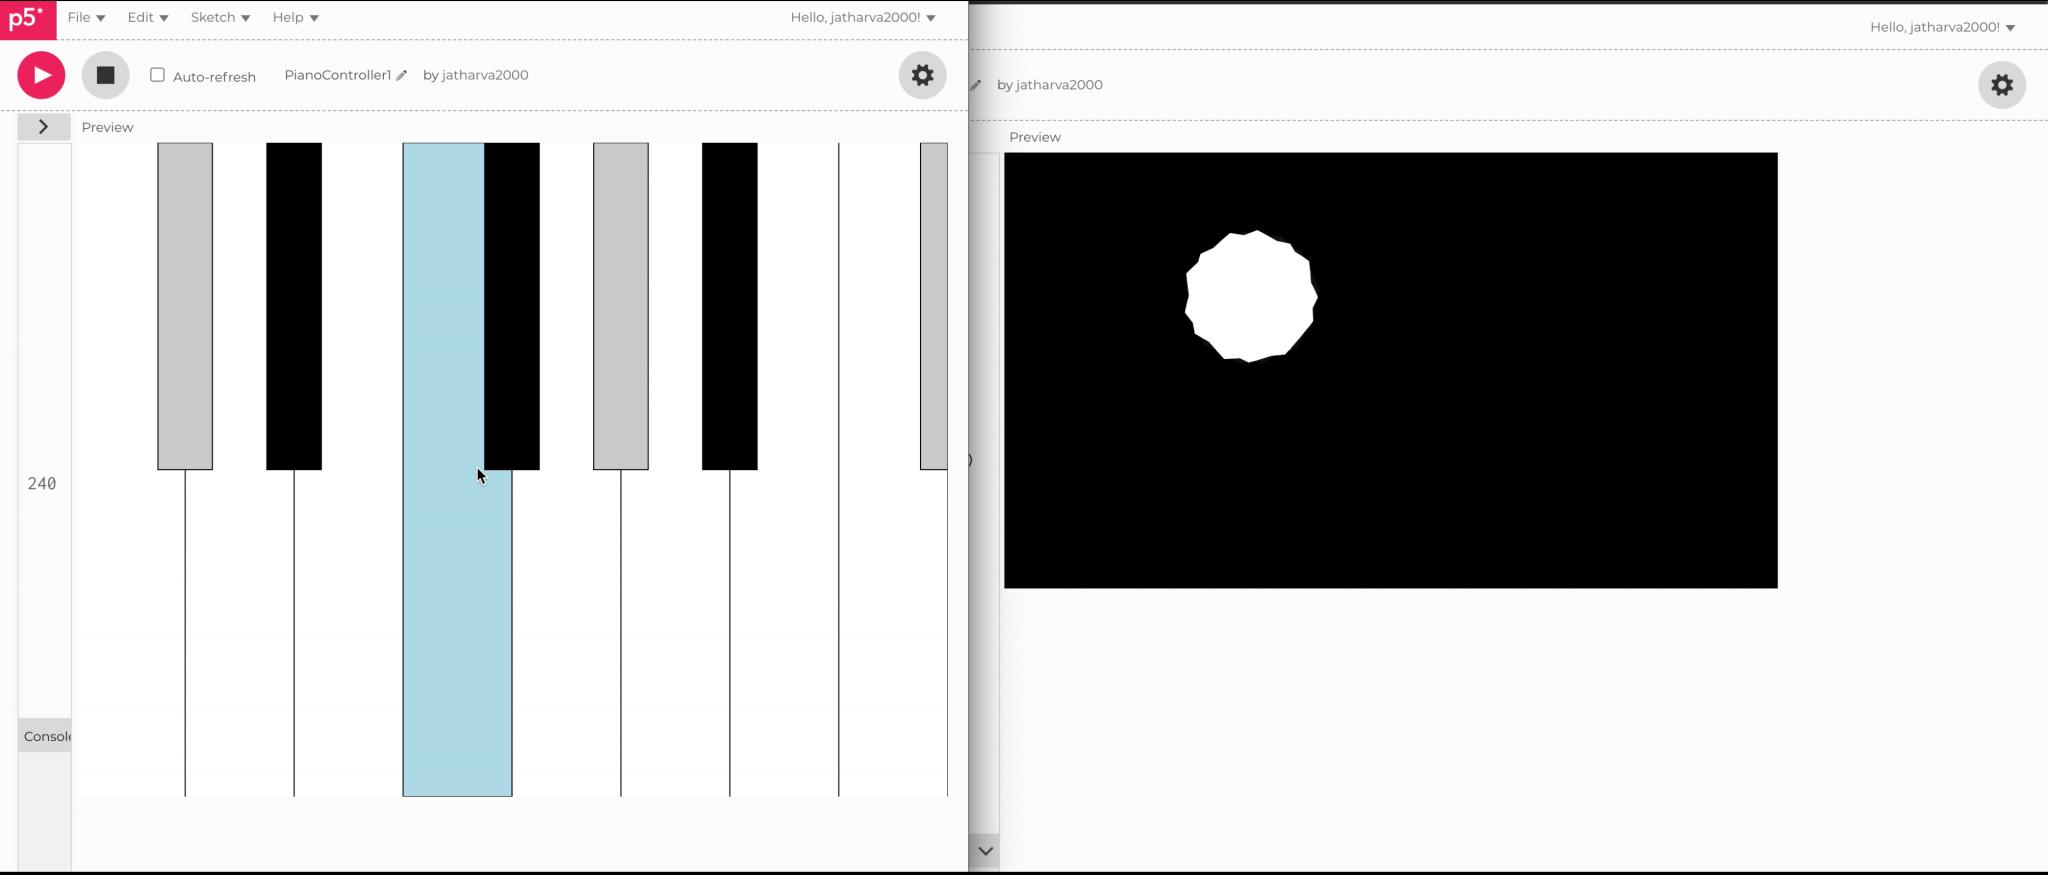 screenshot-2020-09-28-at-11-42-08-pm